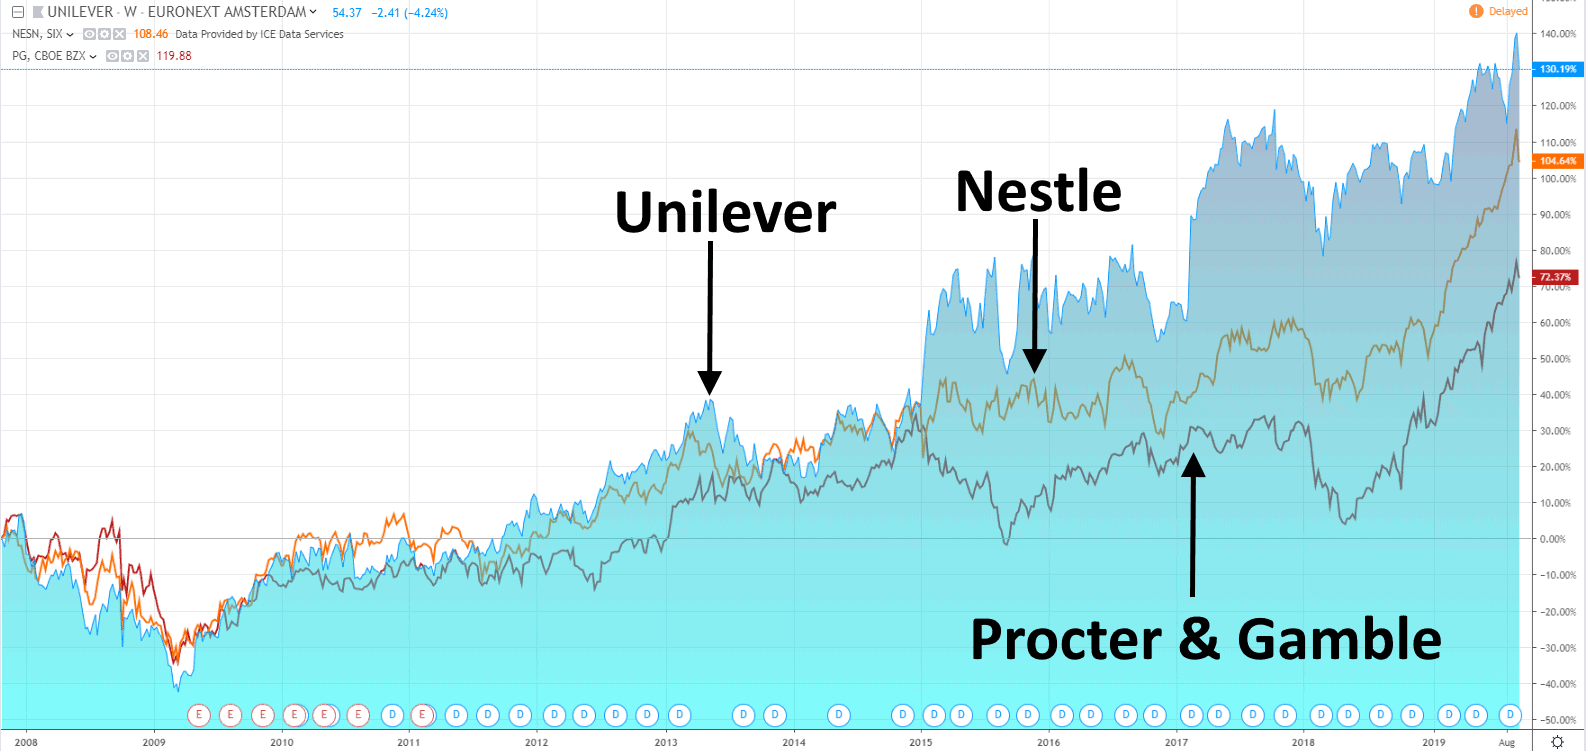 Kursentwicklung von Unilever vs Nestle vs Procter & Gamble